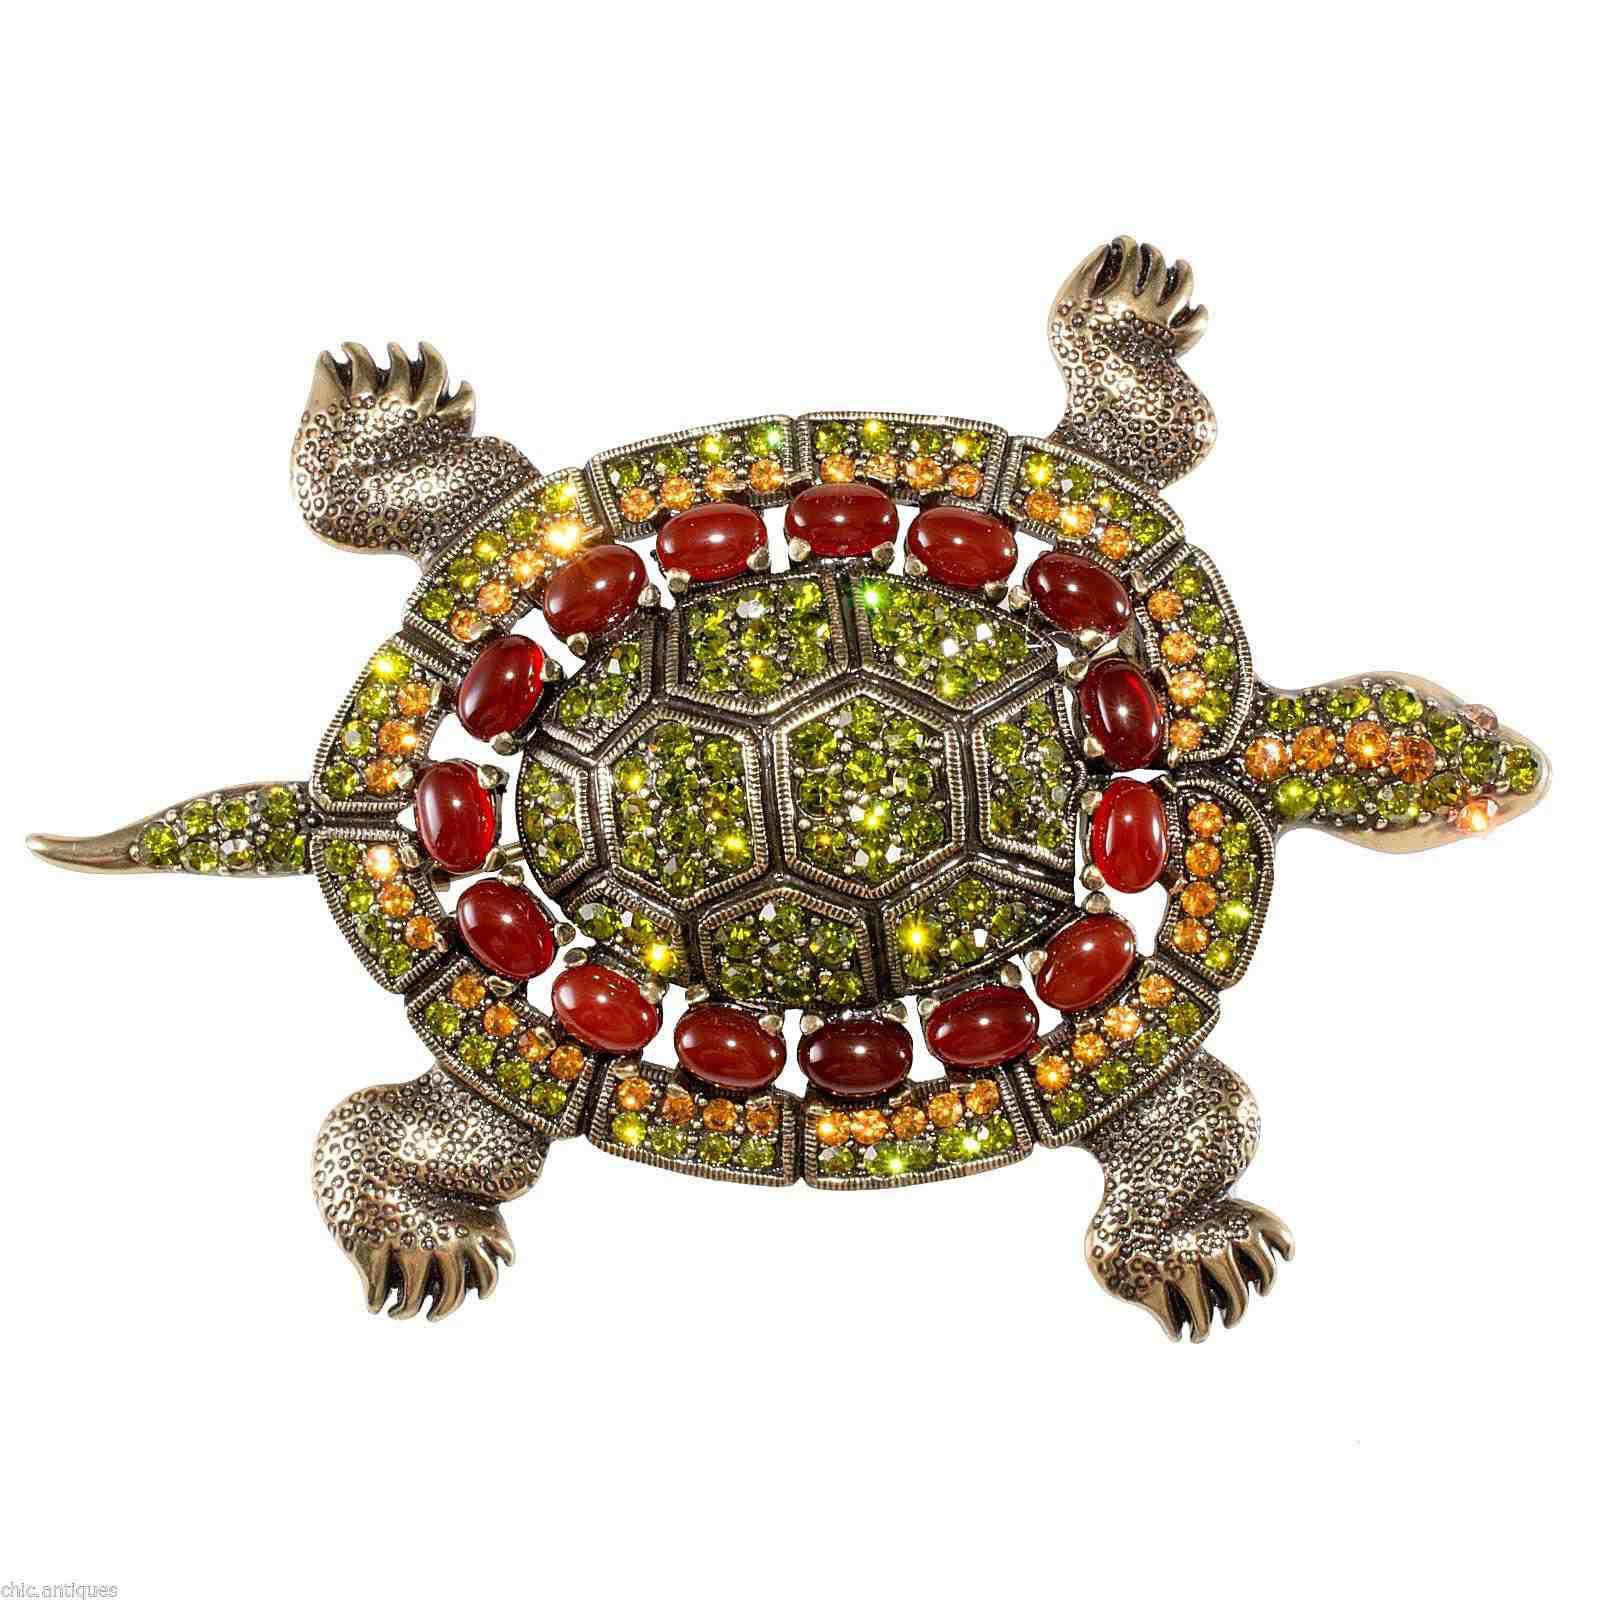 Heidi Daus Turtle Brooch, Made in China